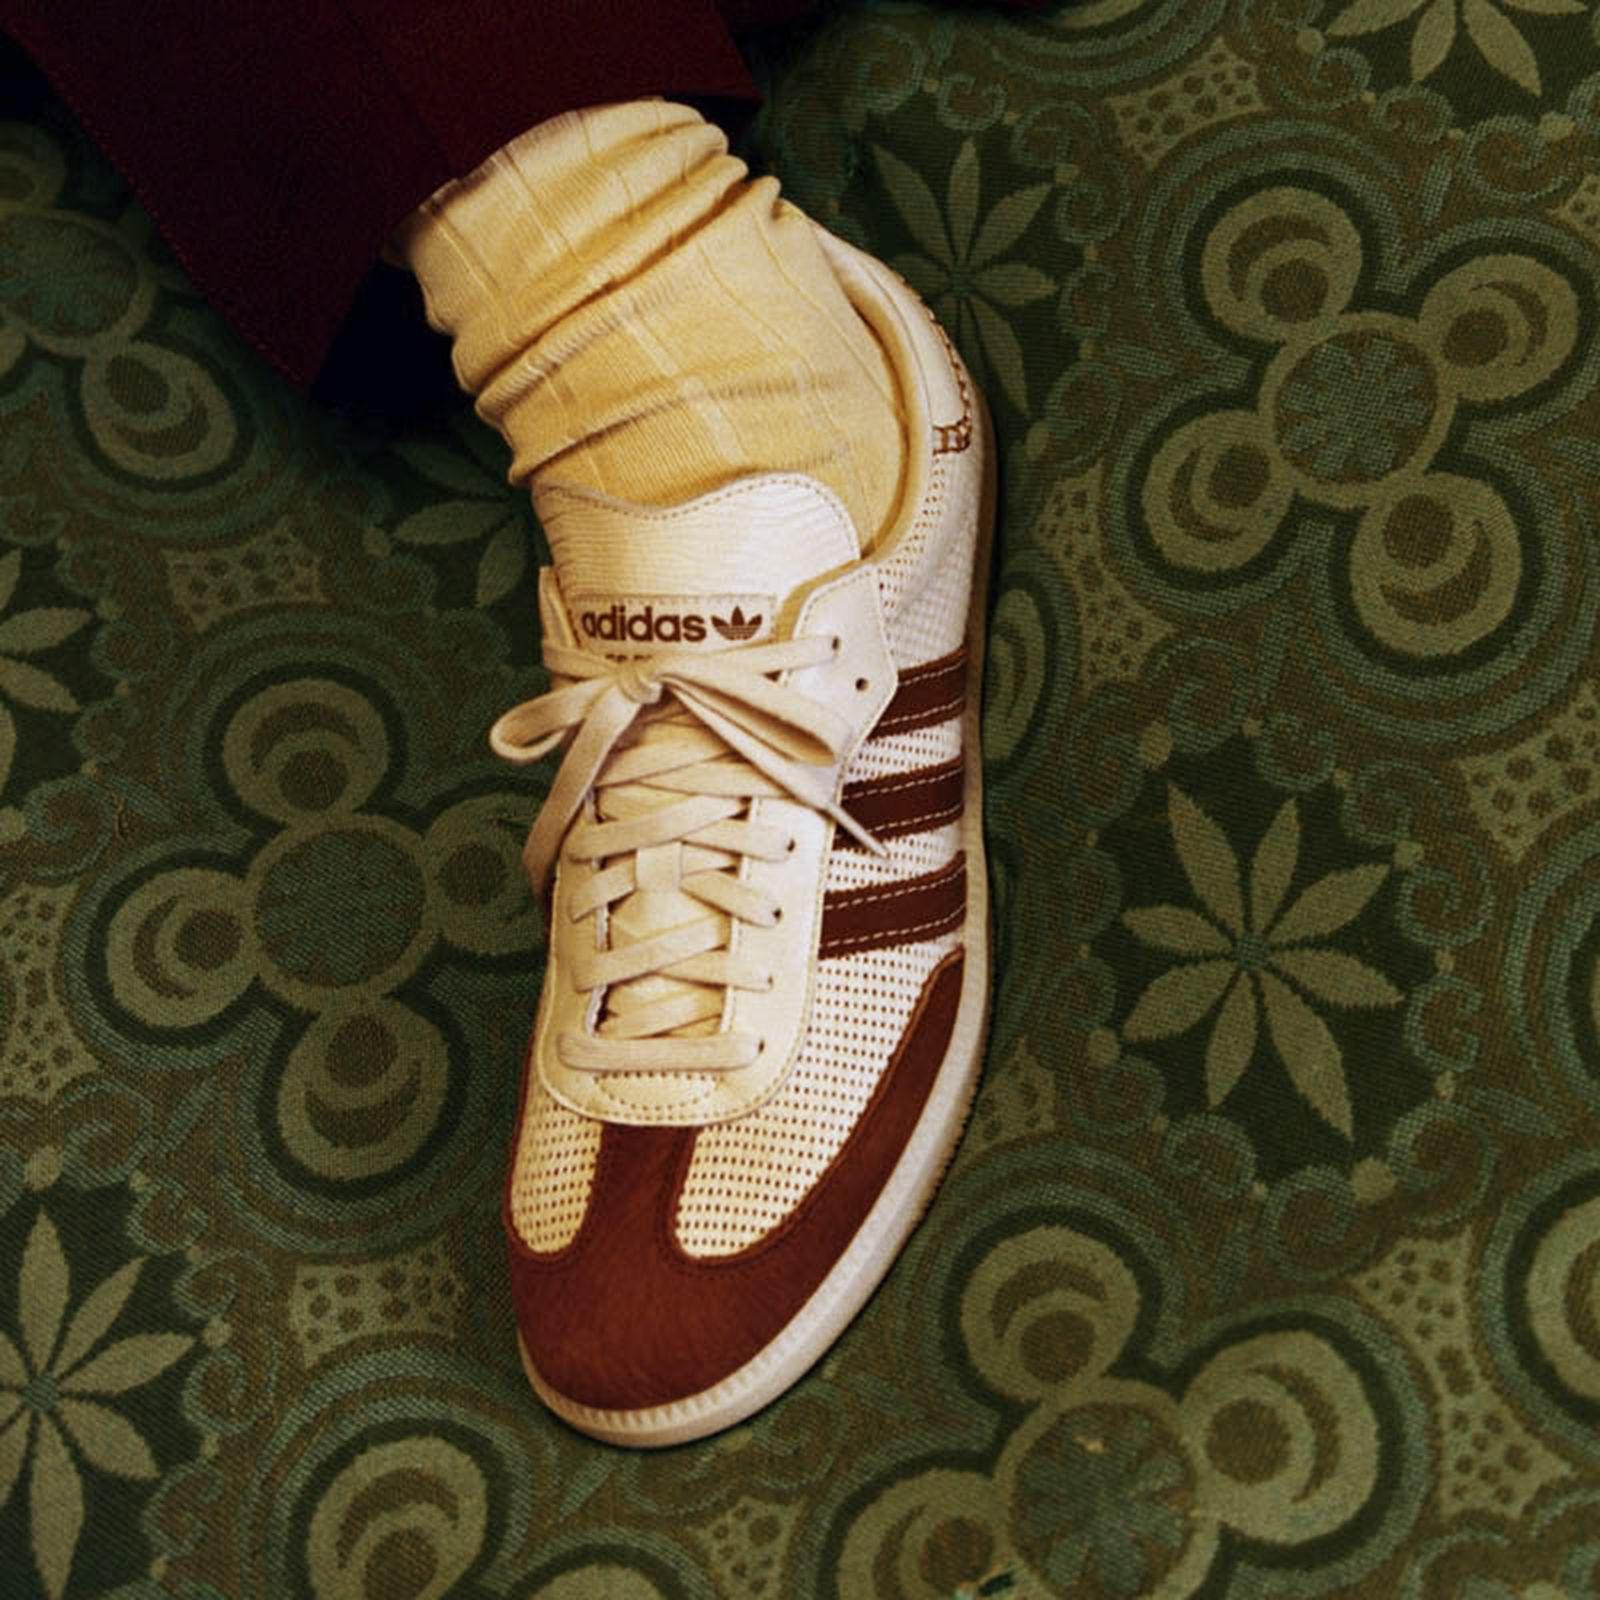 wales-bonner-adidas-originals-samba-release-date-price-campaign-011